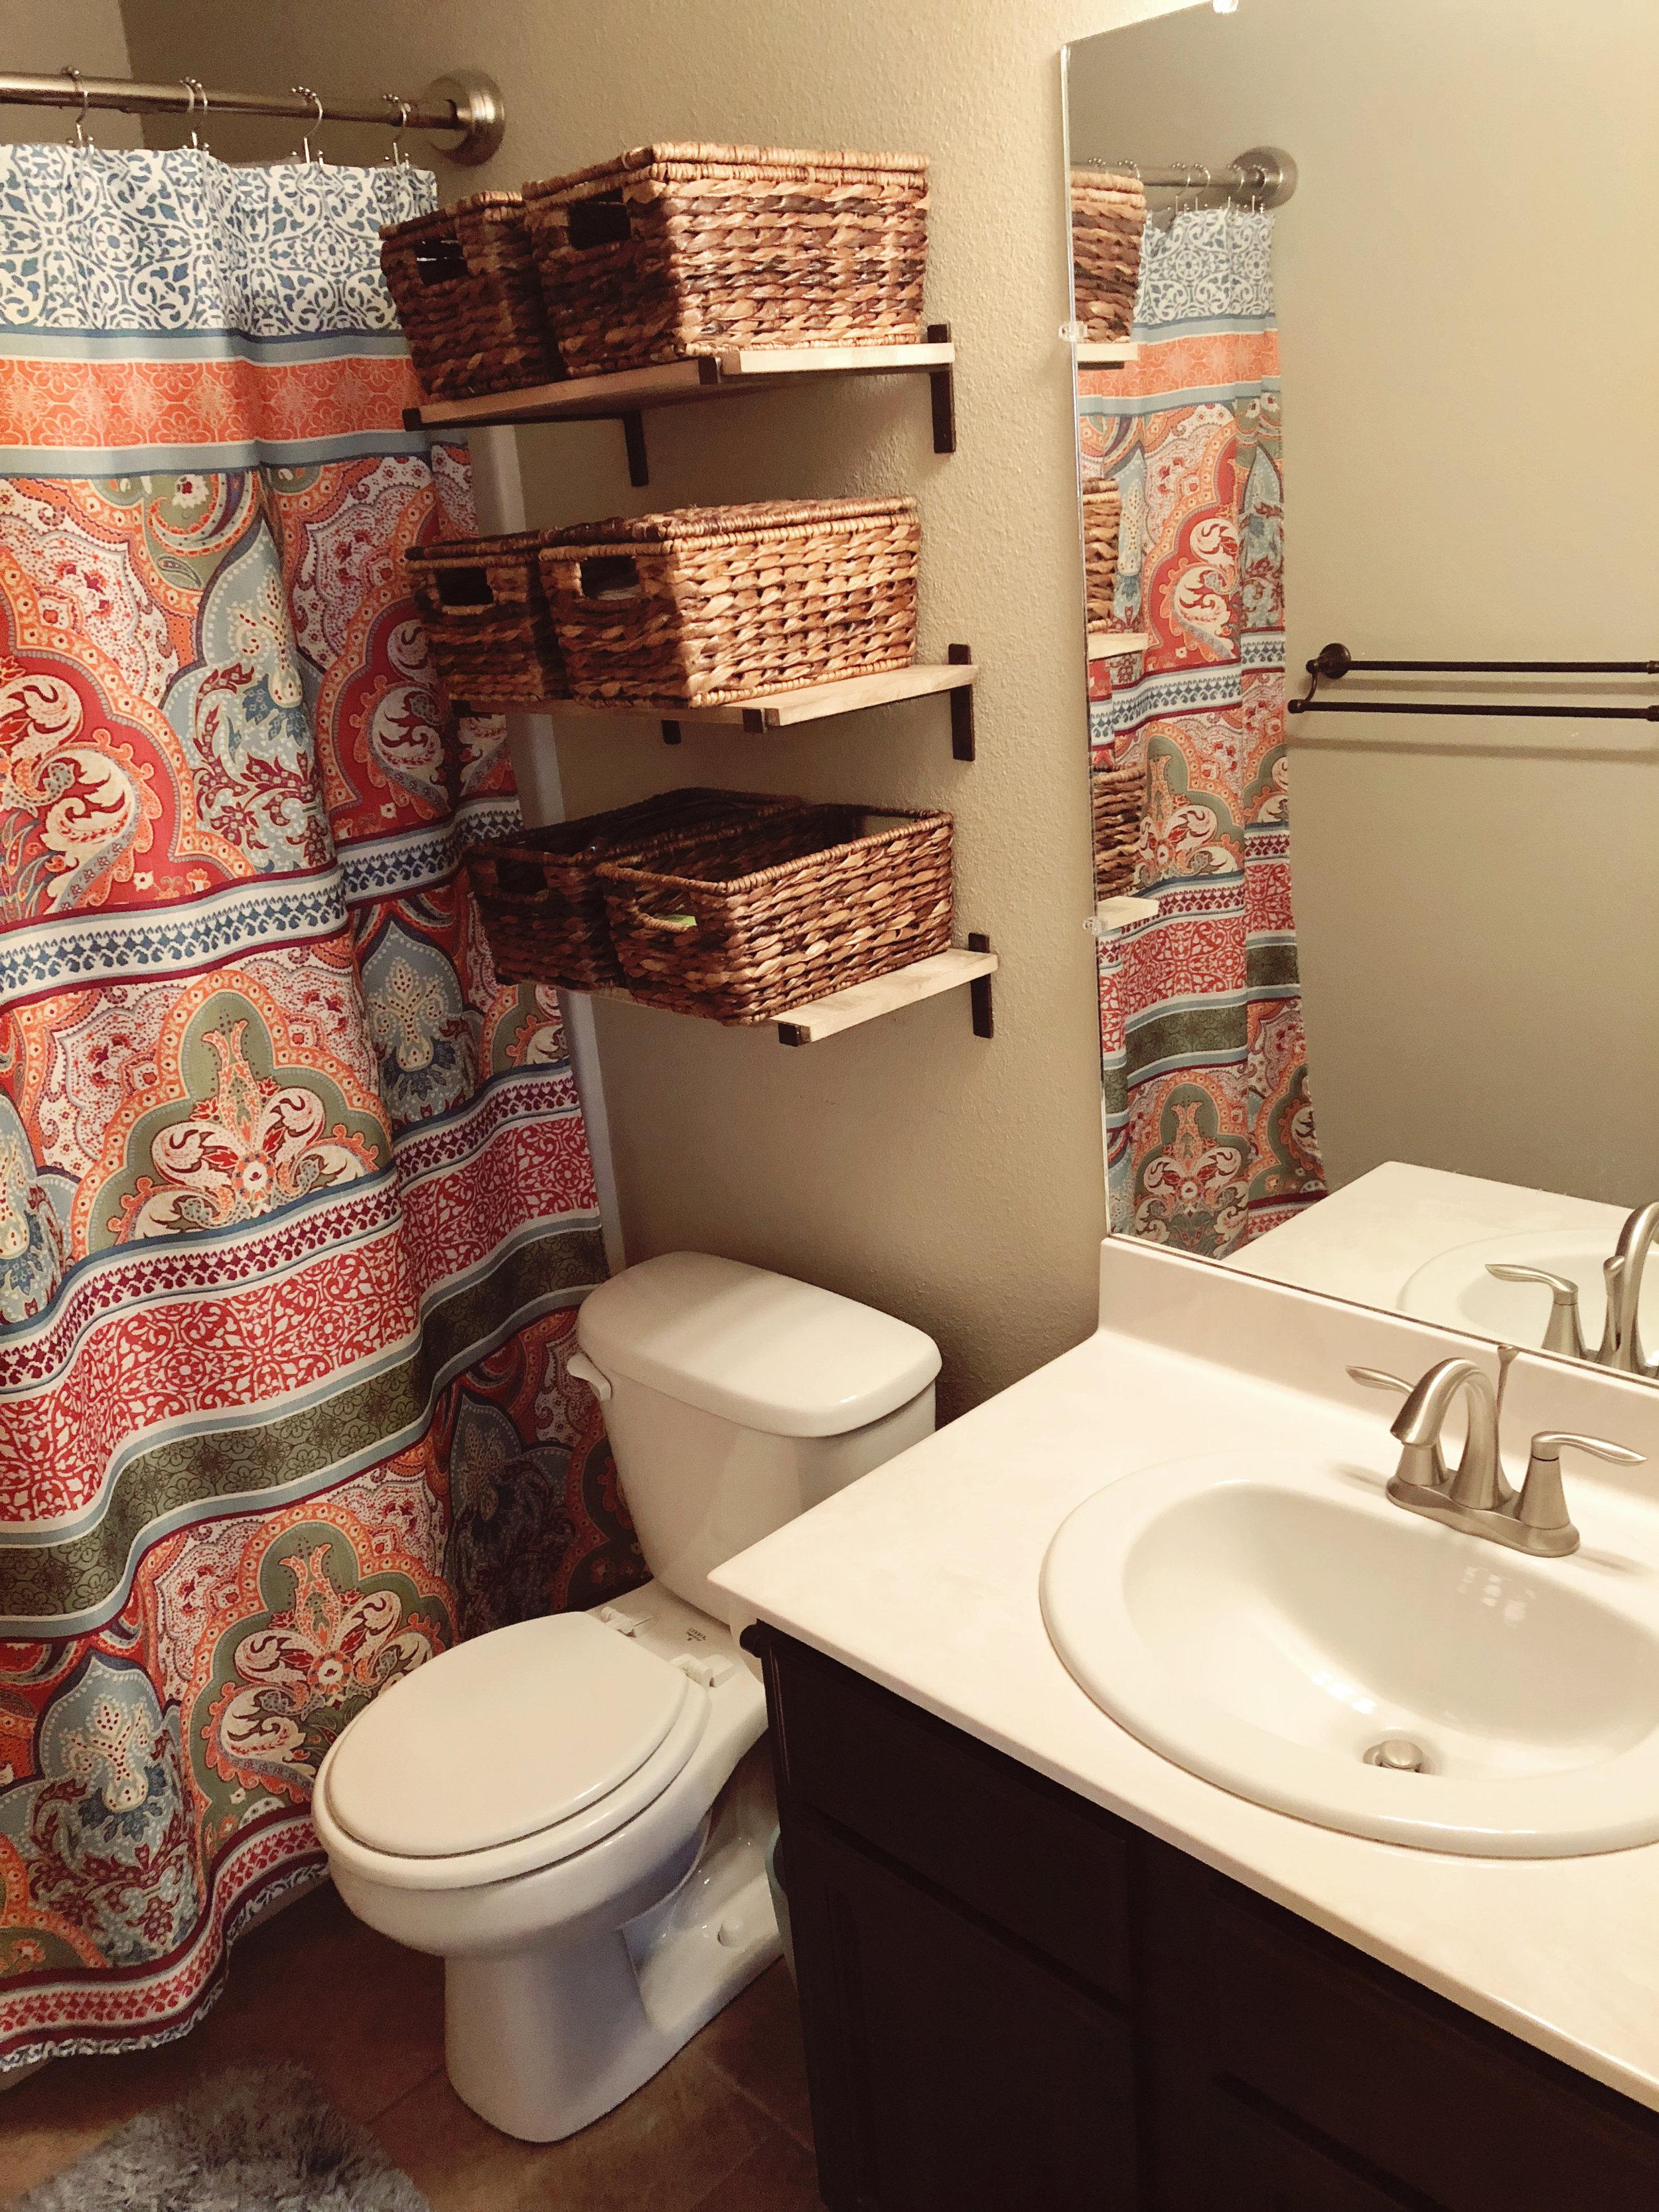 CornwallAve_Bathroom4.jpg